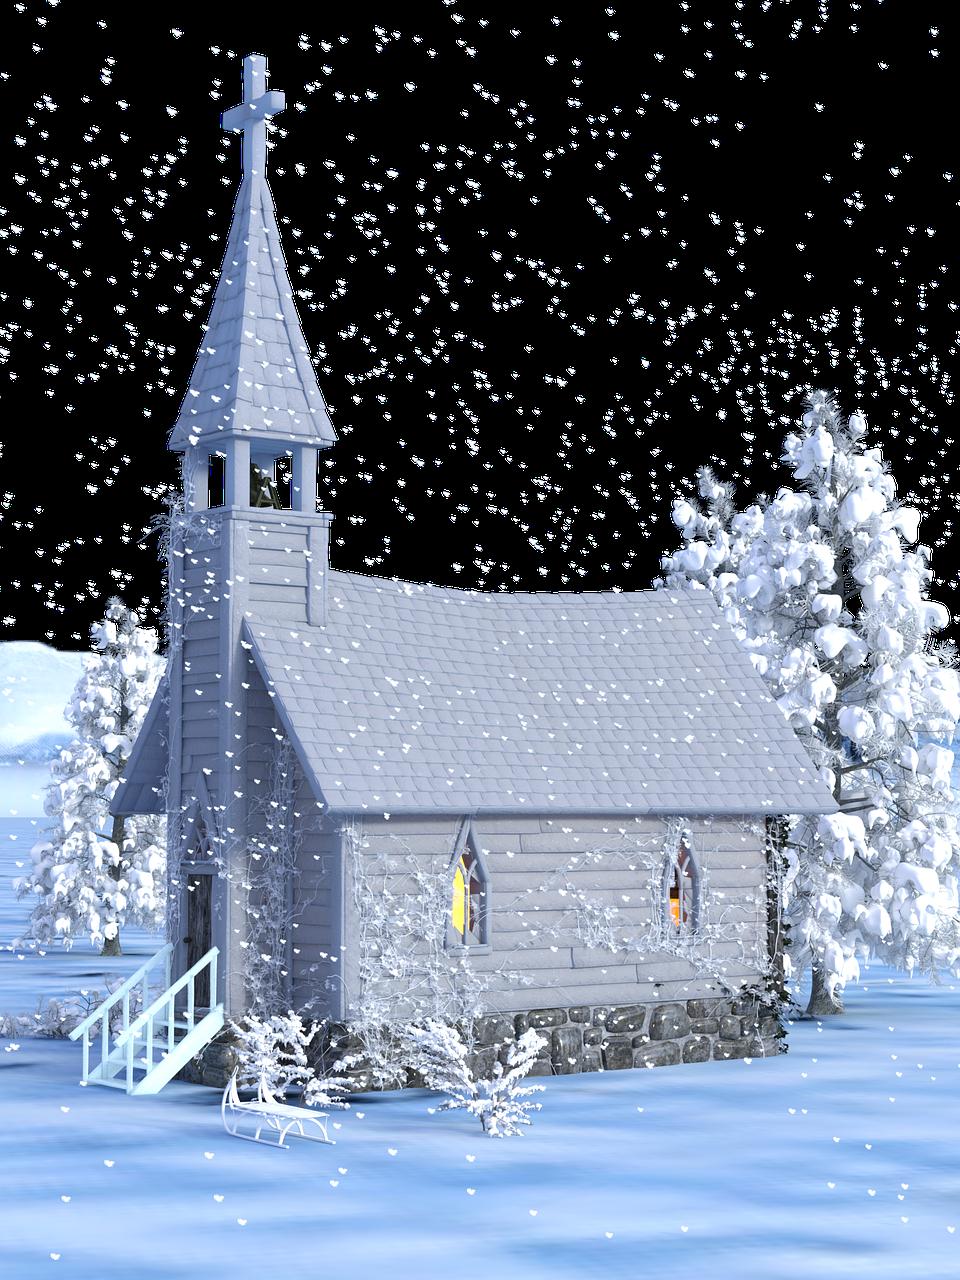 Merry Christmas 2016 Pics